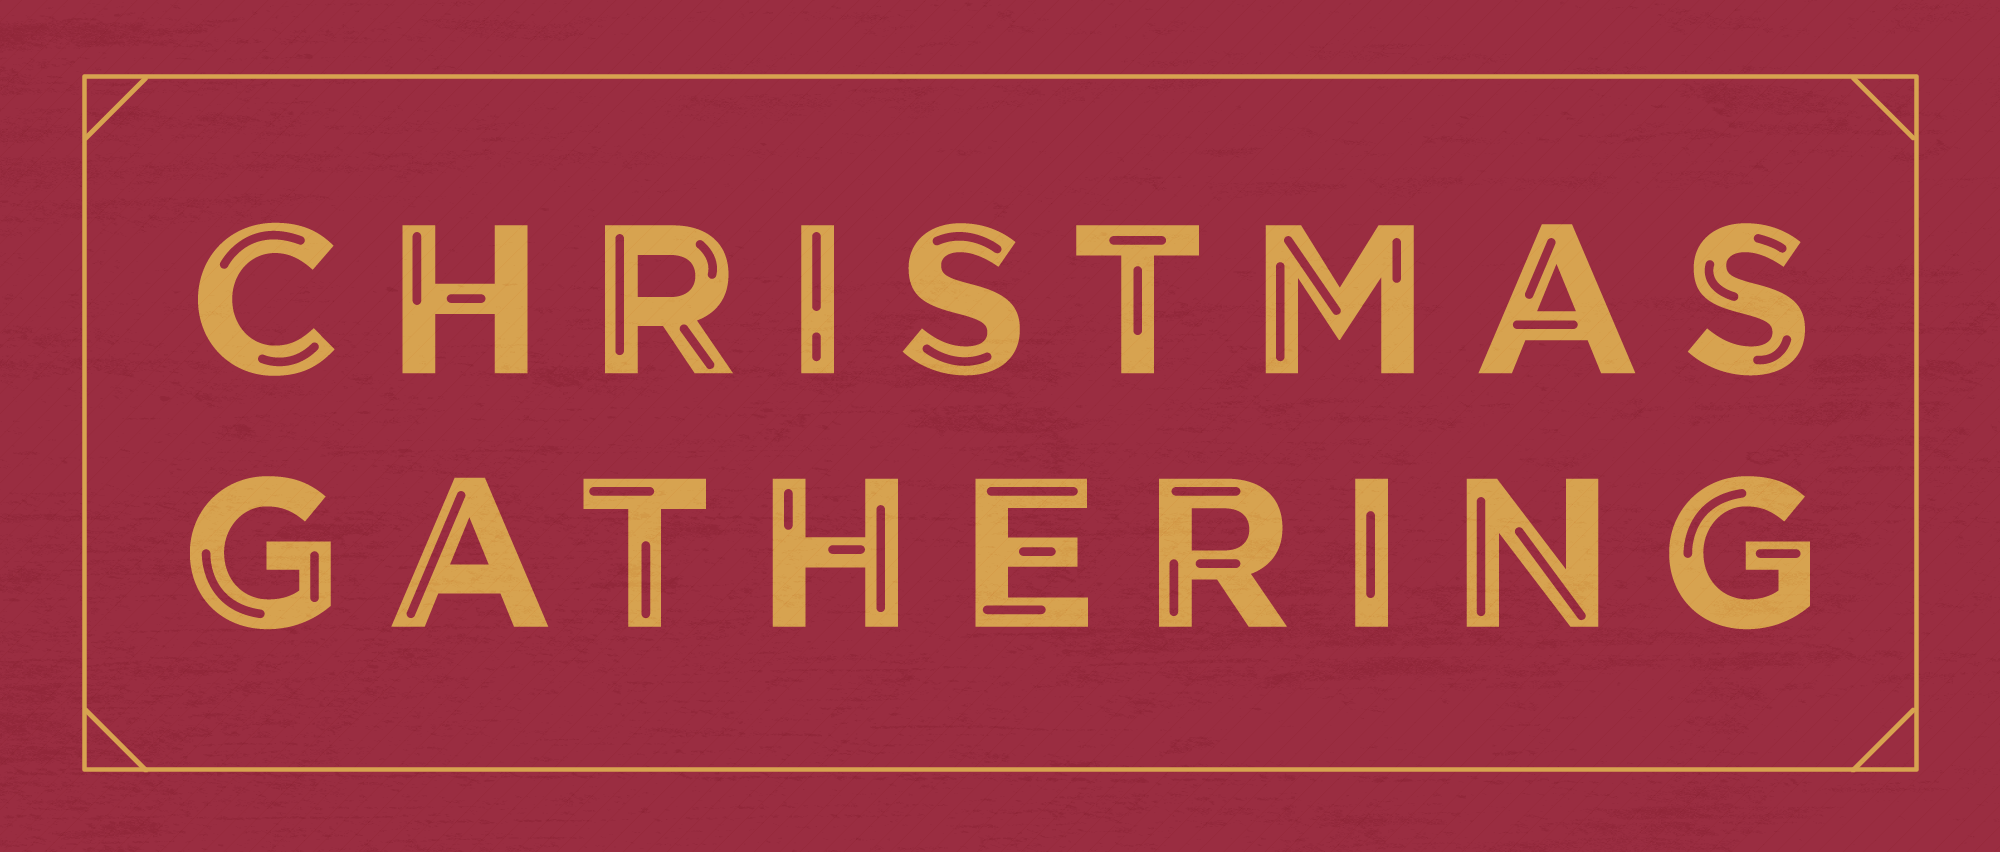 TN Christmas_TWO NOTCH WEB.png